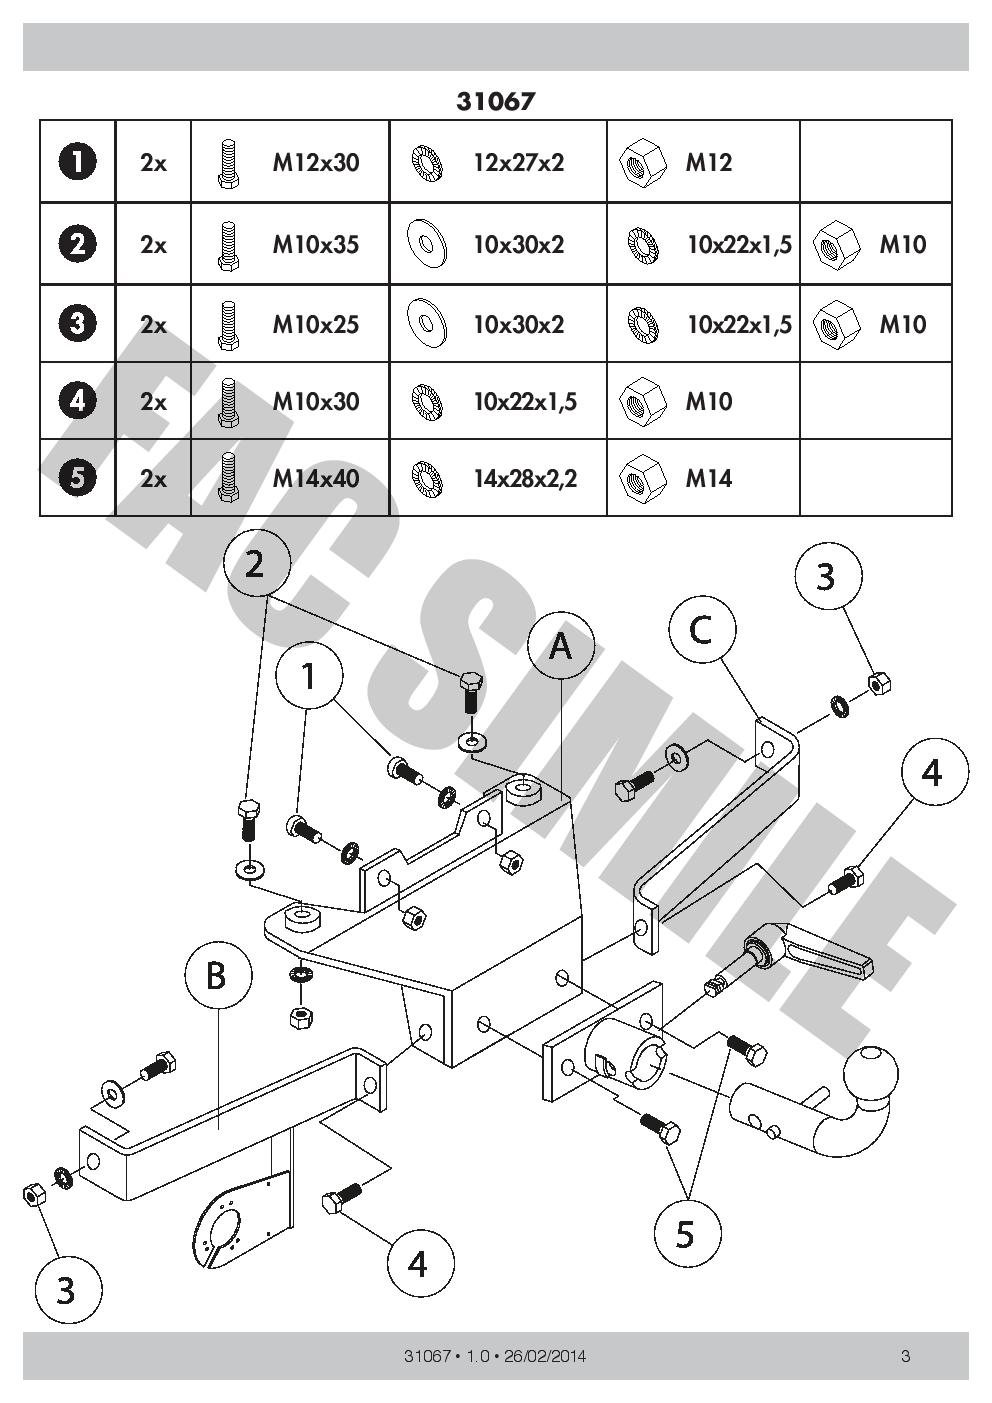 AHK 7p E-Satz C2 Anhängerkupplung Abnehmbare Renault Grand Espace 1997-02 31067